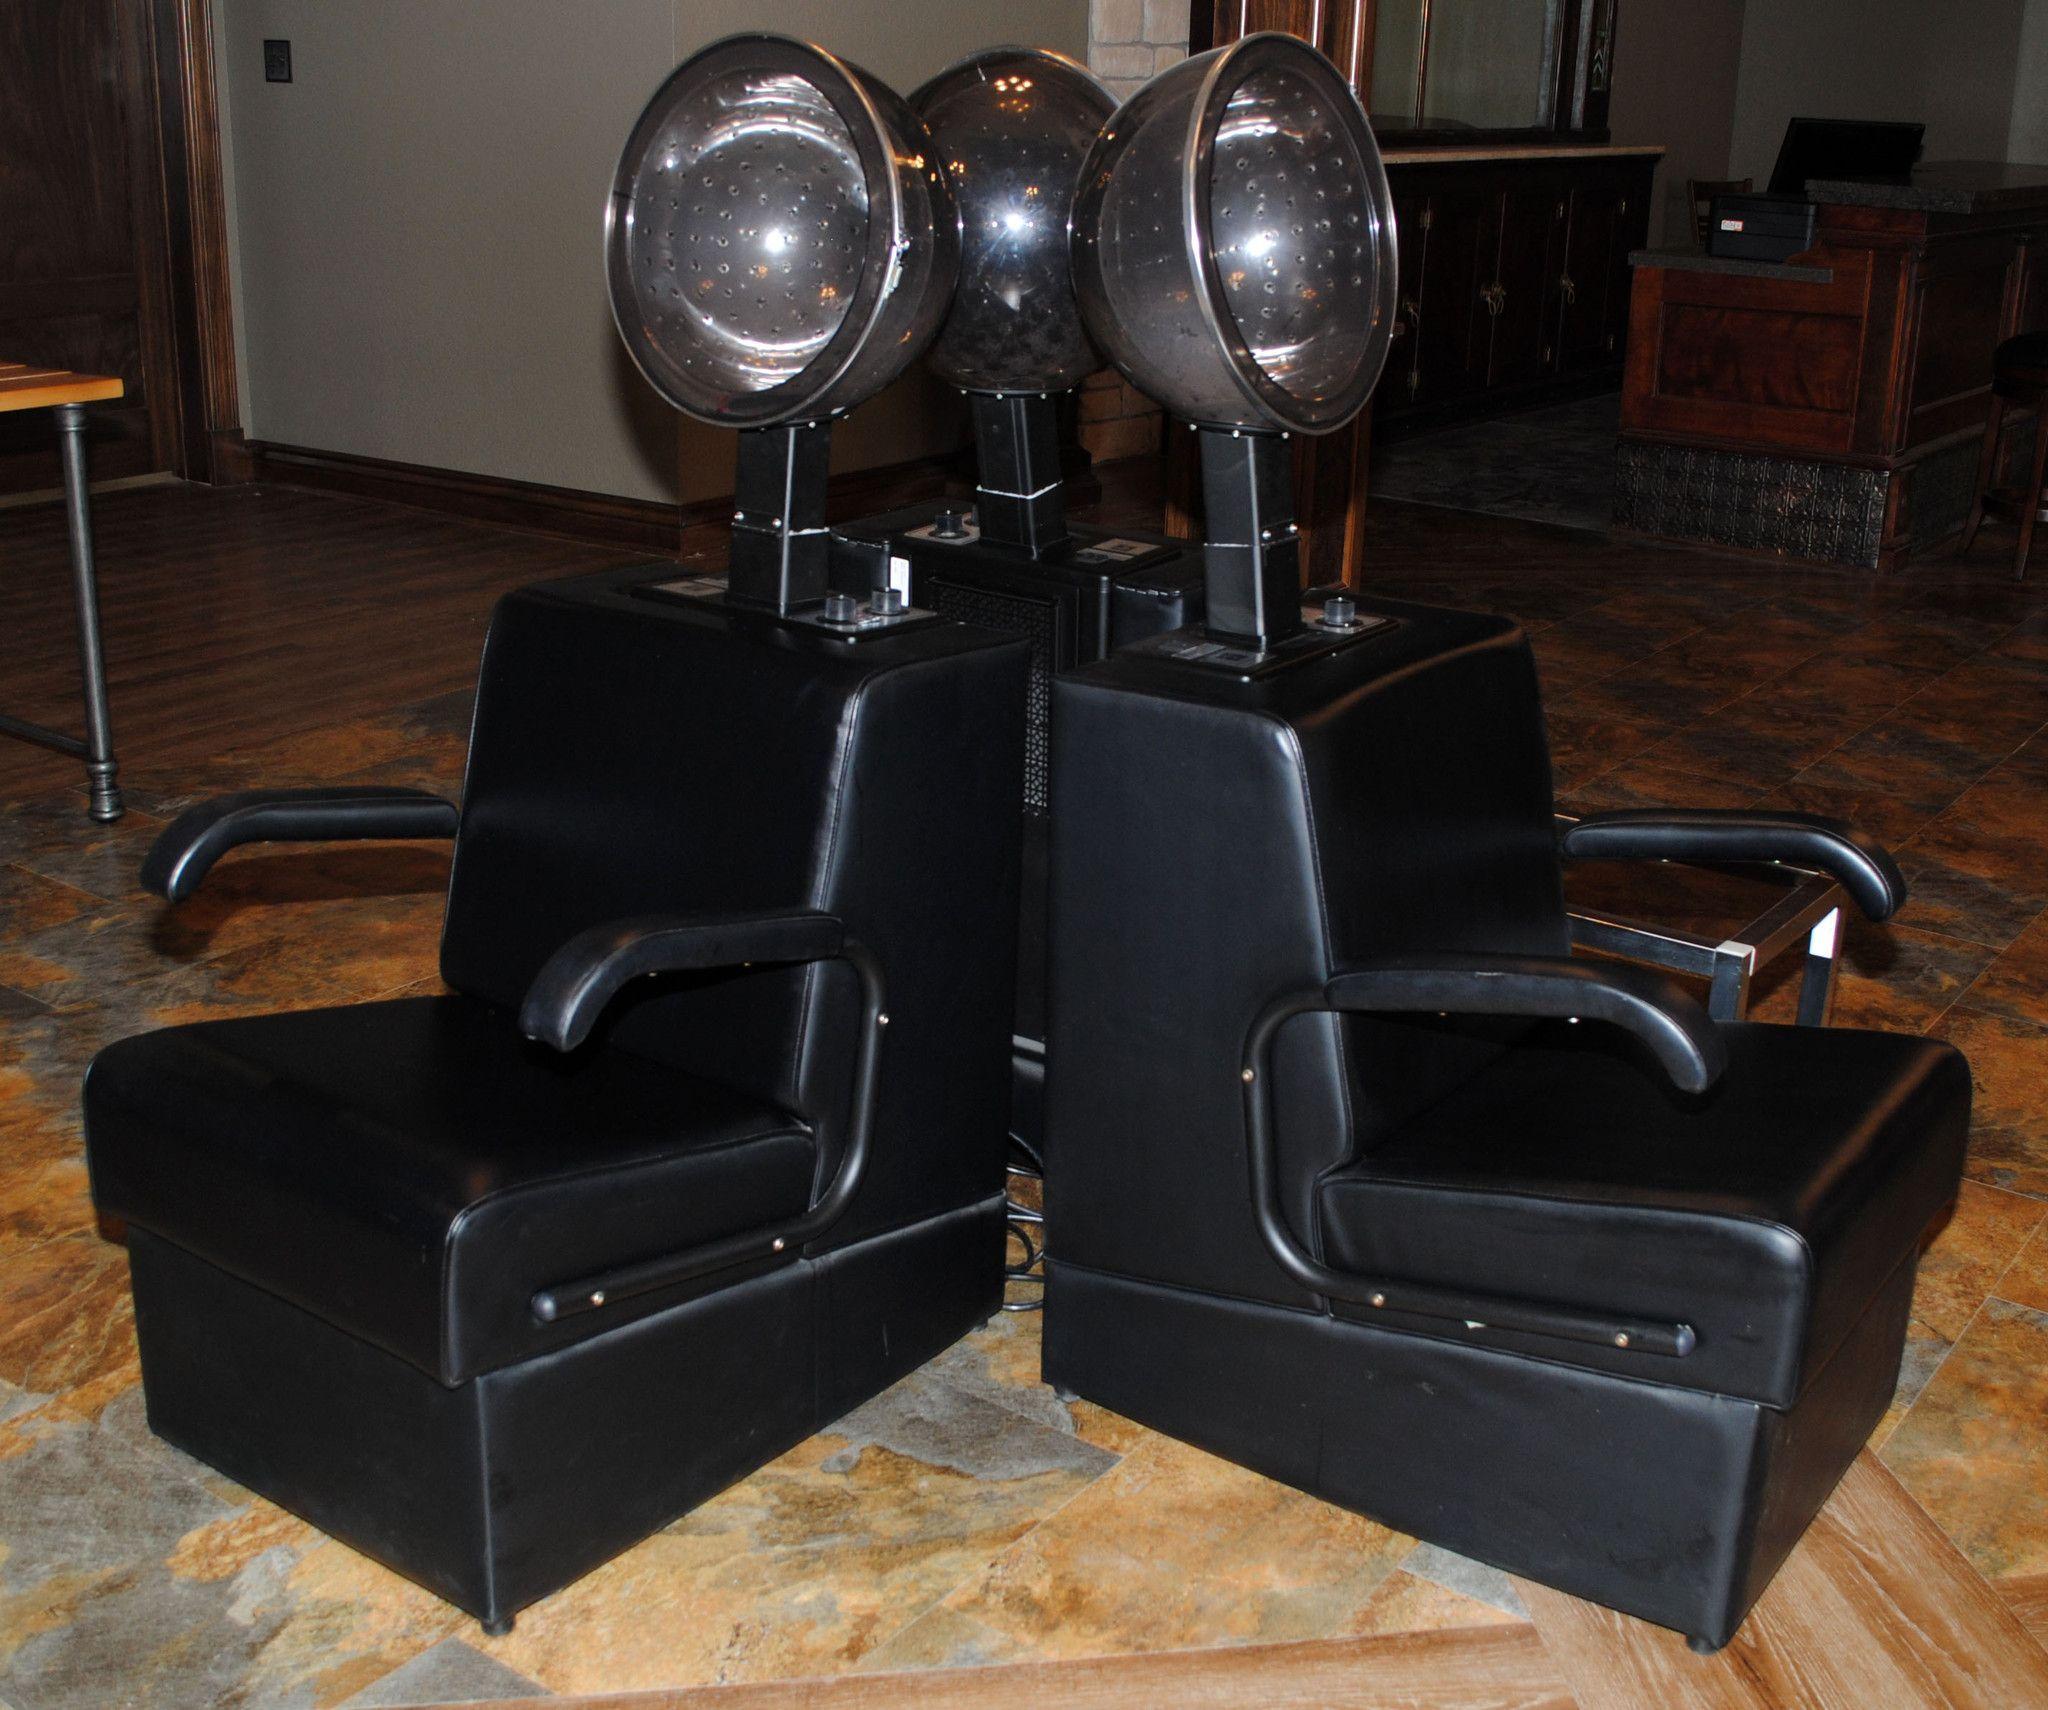 Econo Dryer Chair with Jeffco Dryer Hair salon decor